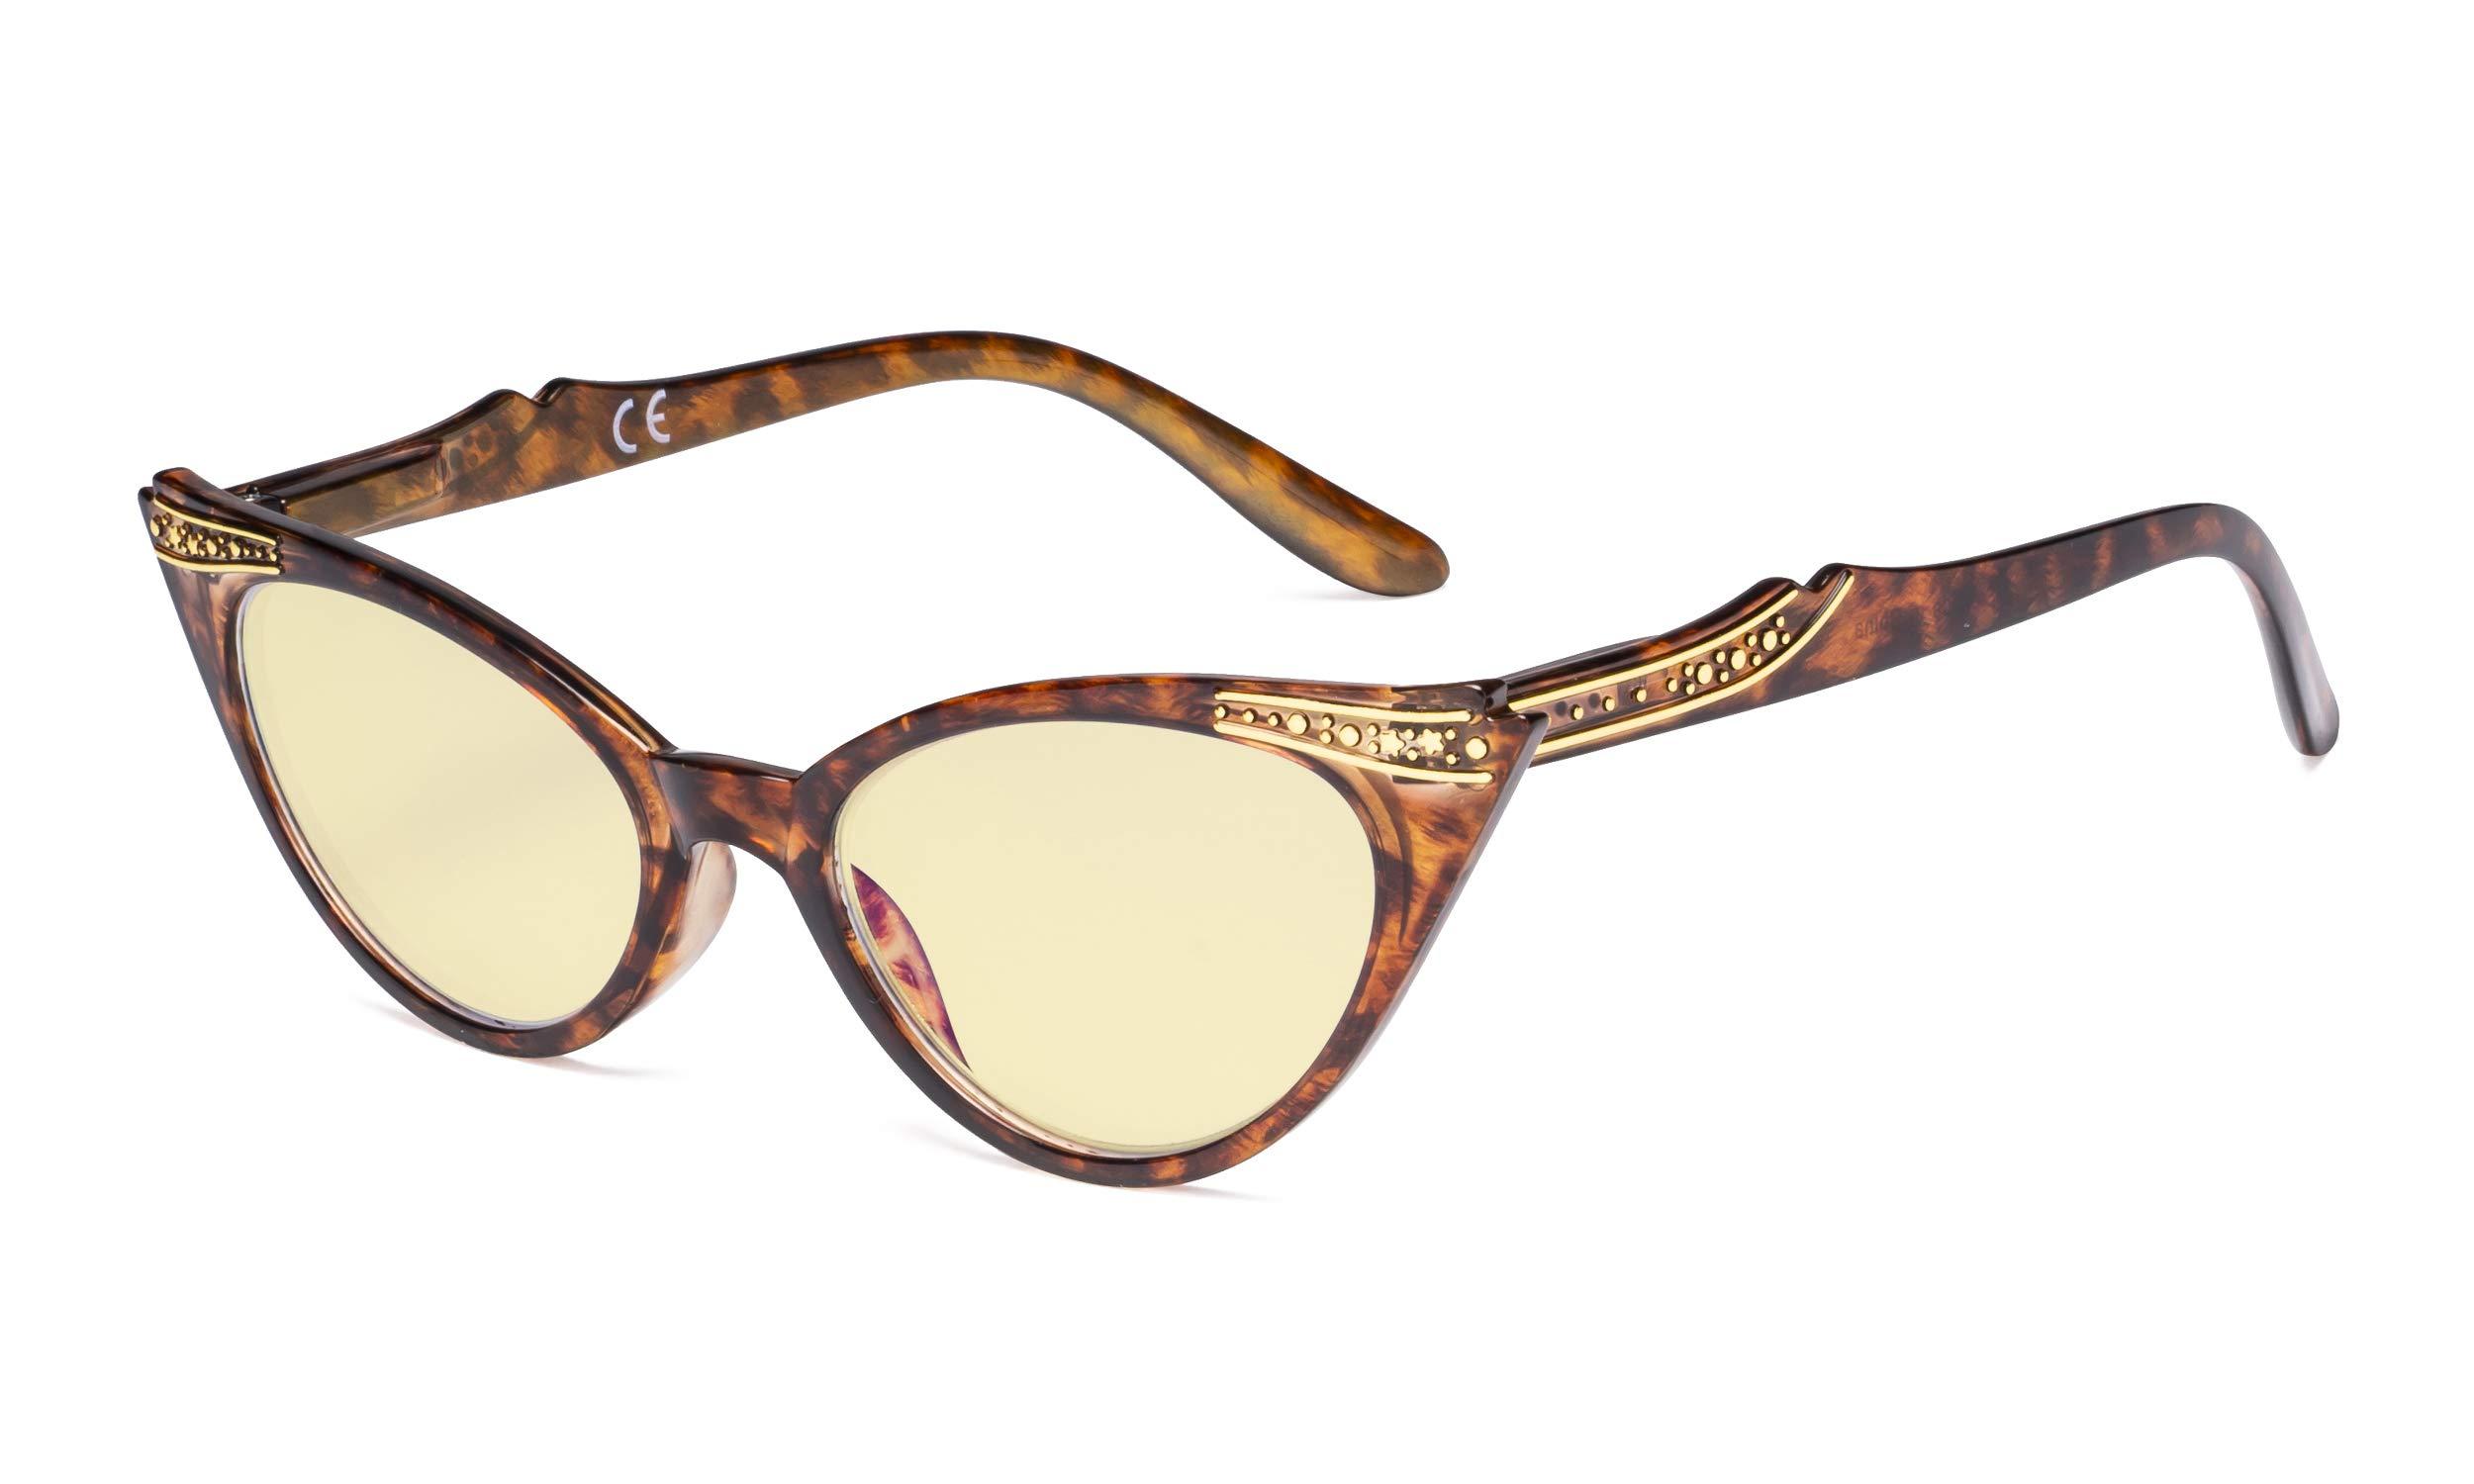 Eyekepper Ladies Blue Light Blocking Glasses with Yellow Filter Lens - Cateye Computer Eyeglasses Women - Tortoise